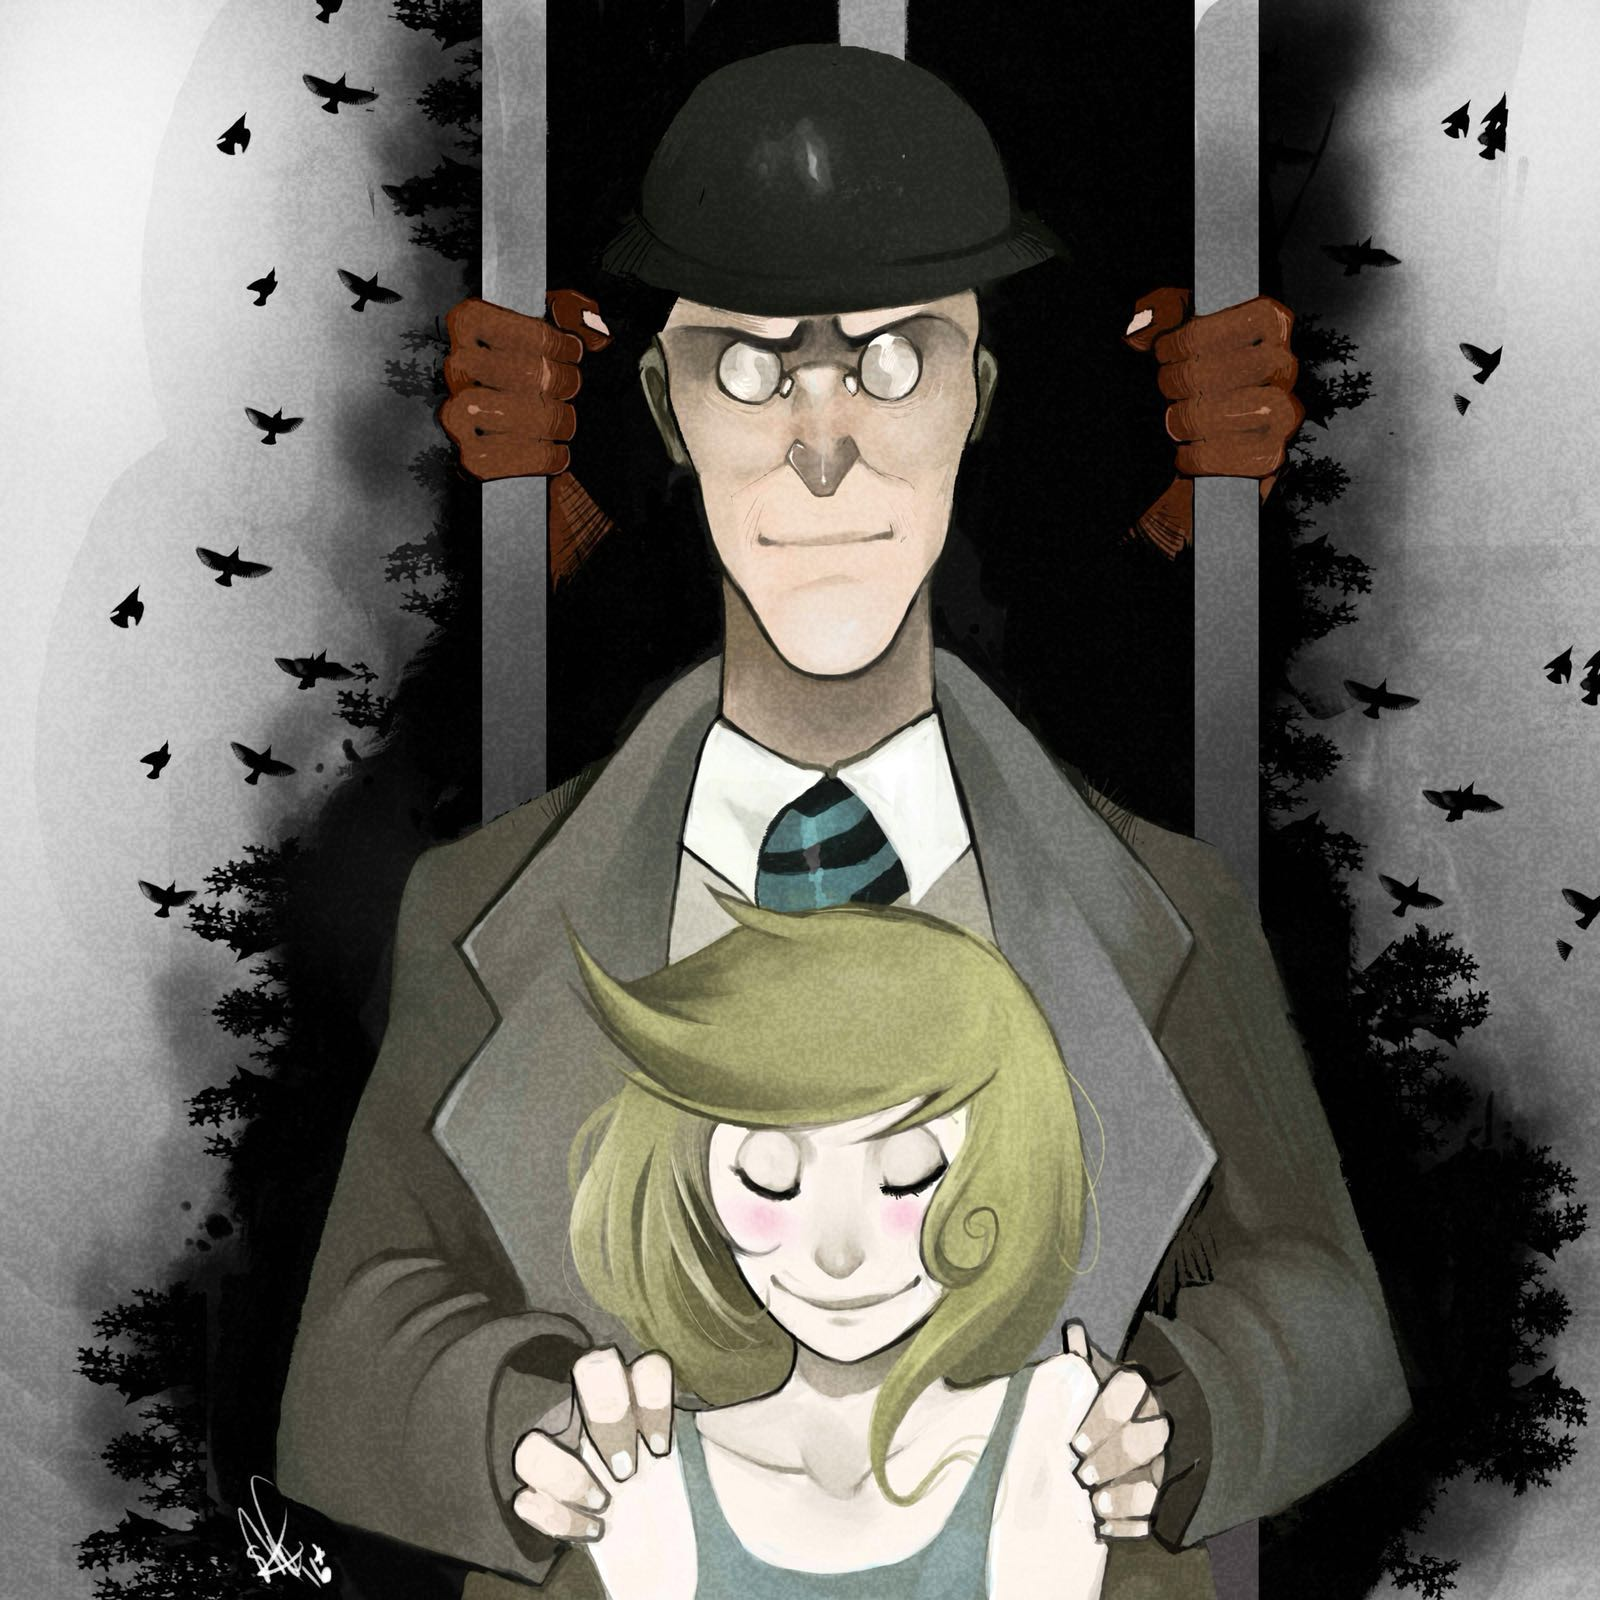 Custom cover of To Kill A Mockingbird by Bader Shirawi